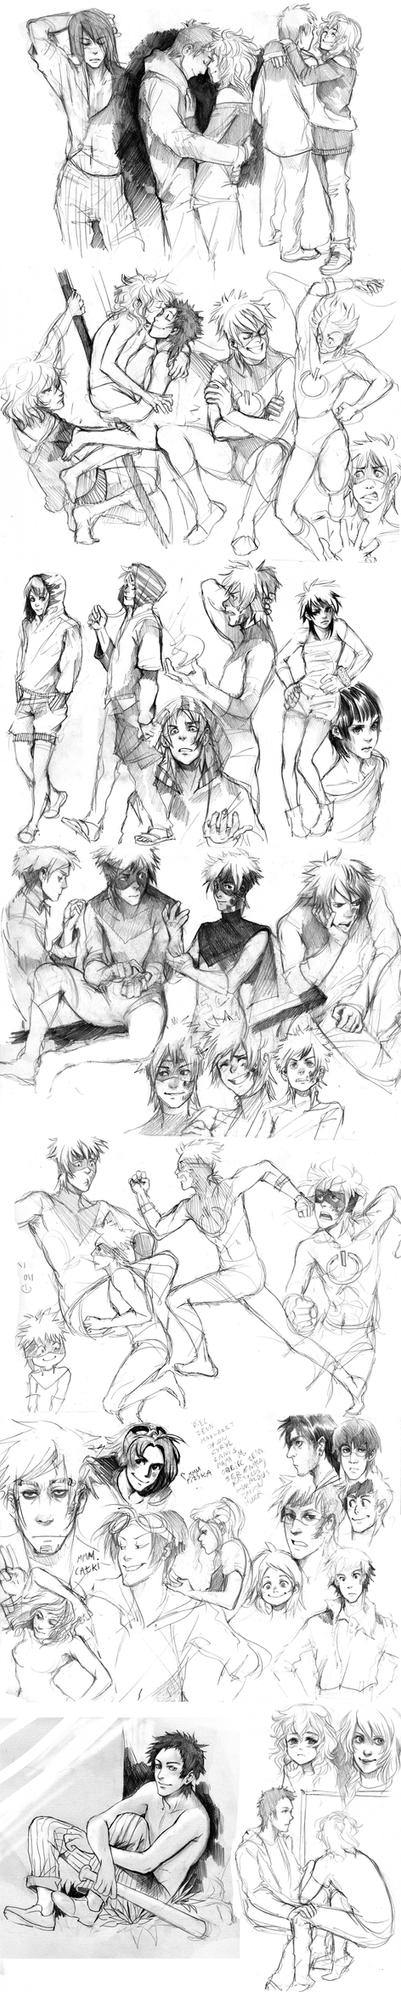 sketches-friday-monday by Razuri-the-Sleepless